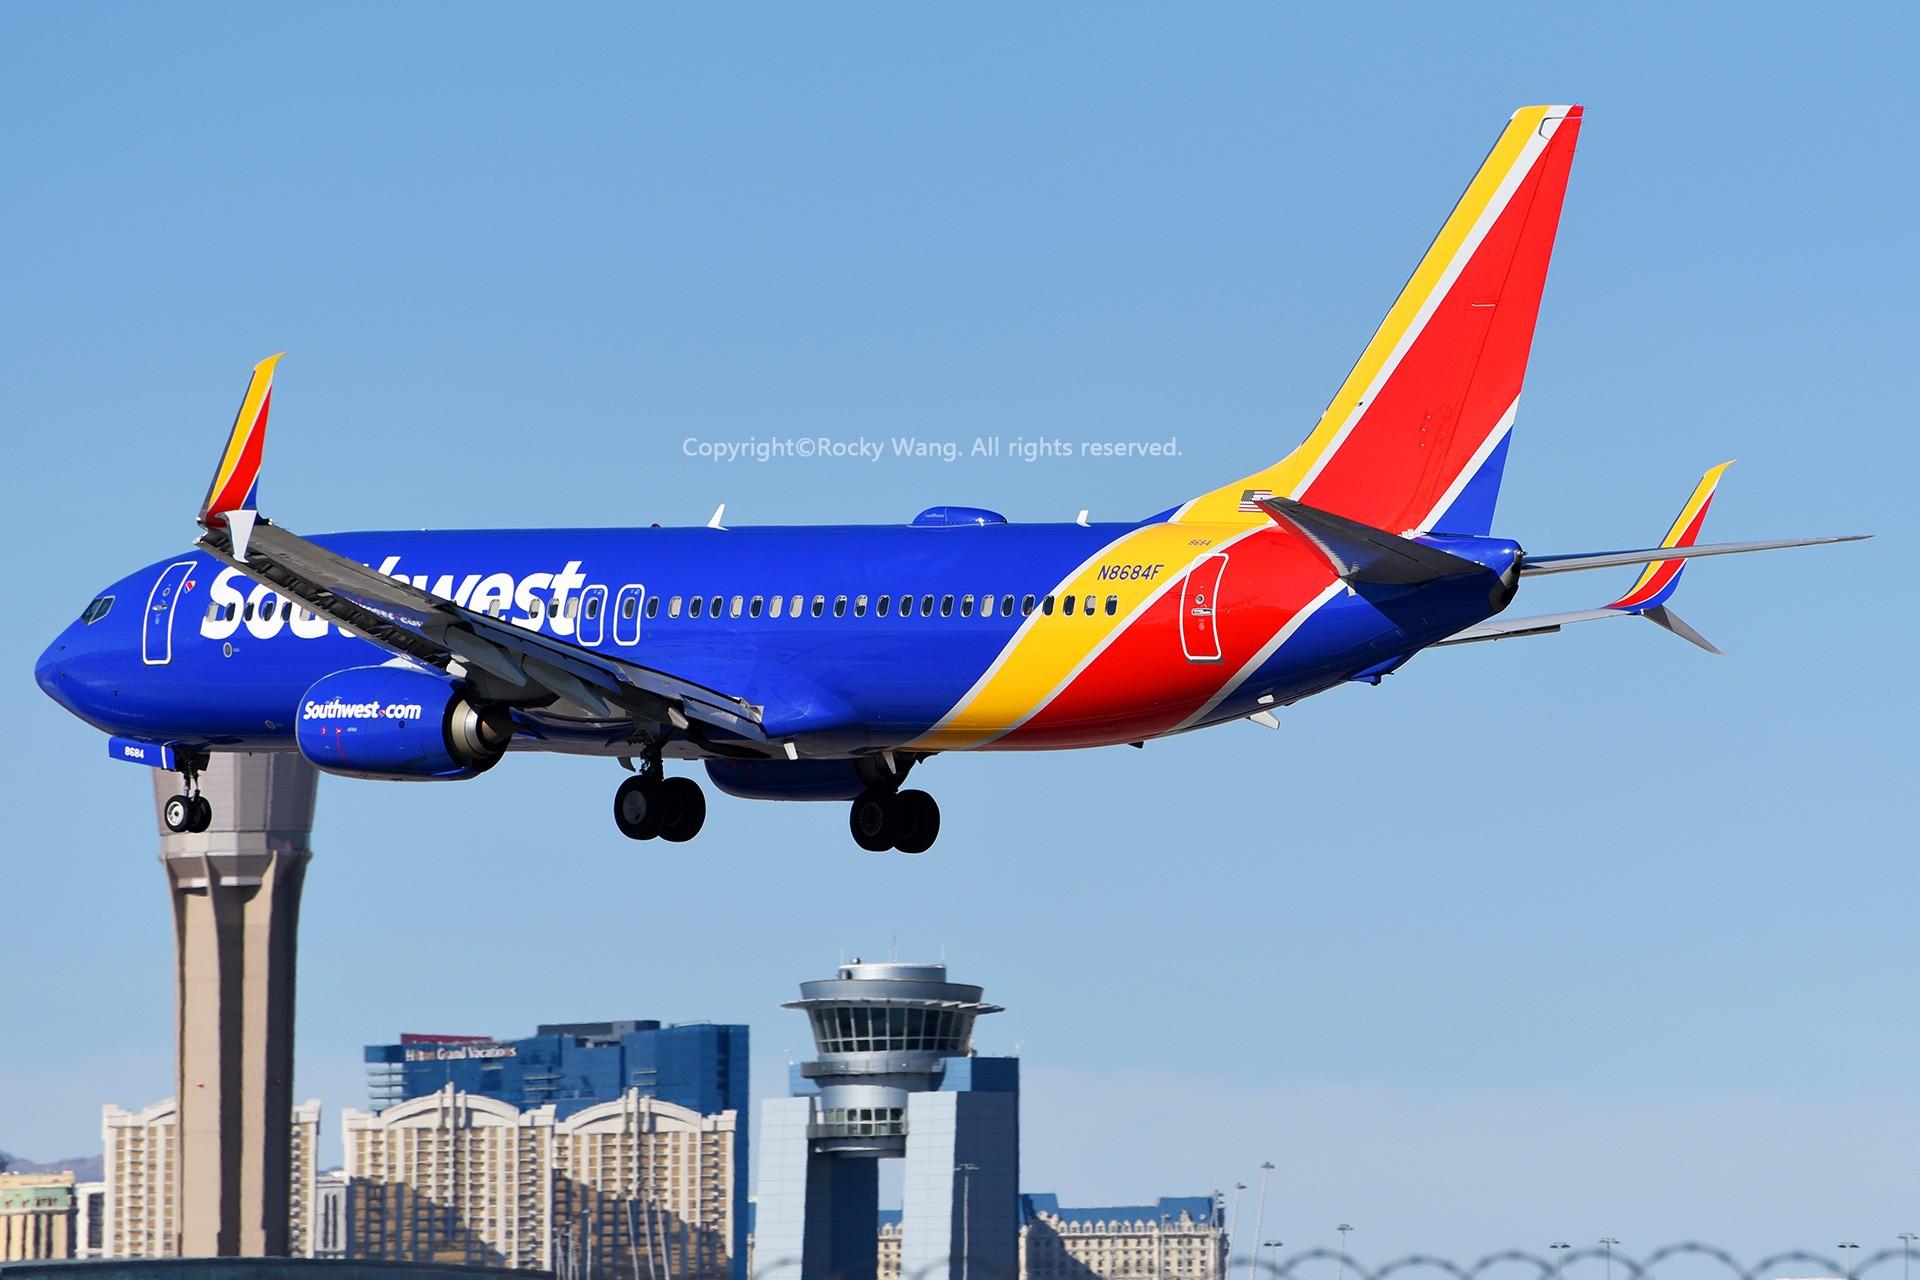 Re:[原创]窄体连连看 BOEING 737-8H4 N8684F 美国拉斯维加斯麦卡伦机场